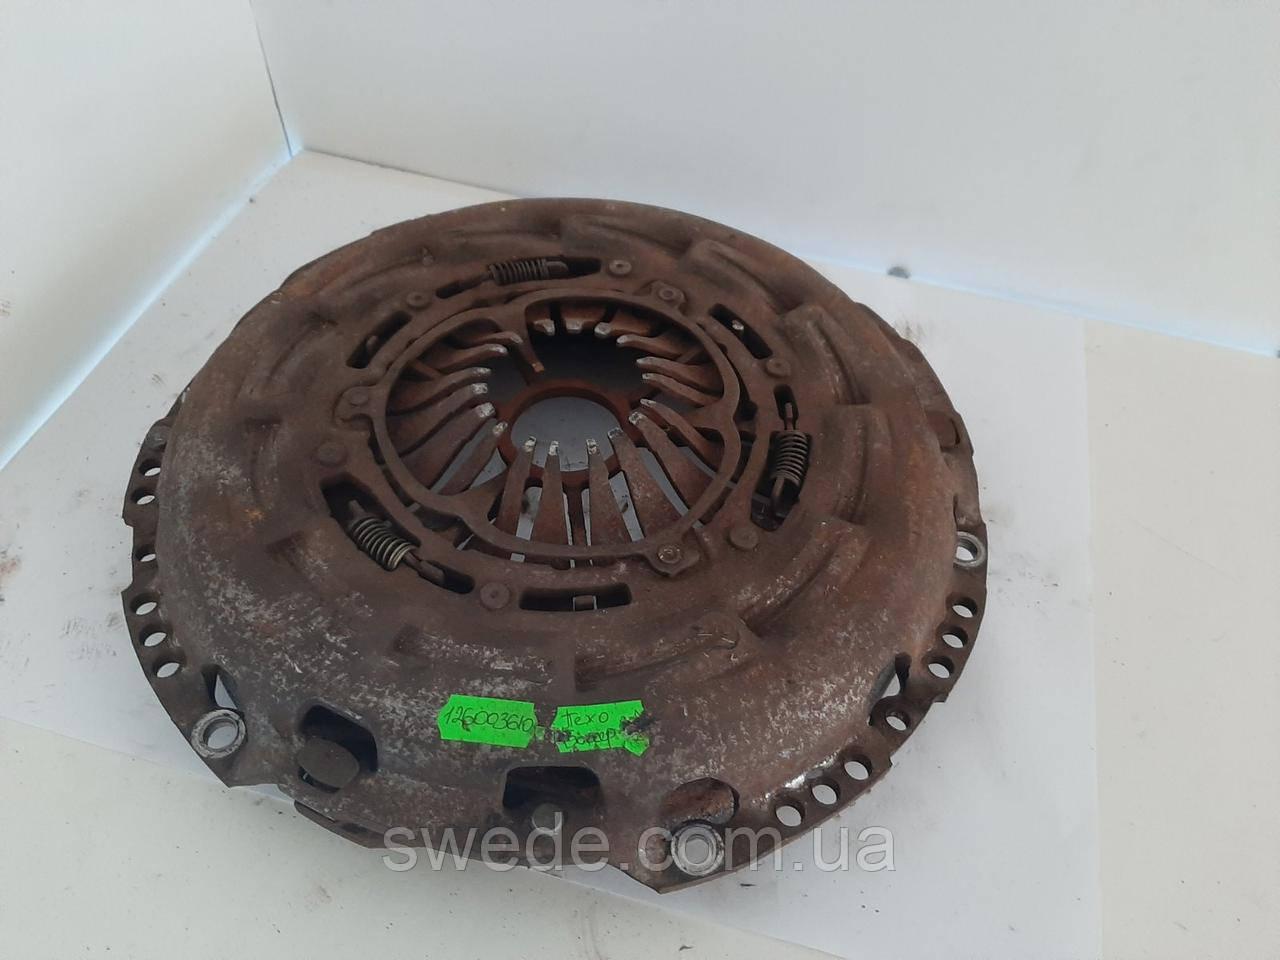 Корзина сцепления Peugeot Boxer 2.2 HDI 2006-2014 гг 126003610